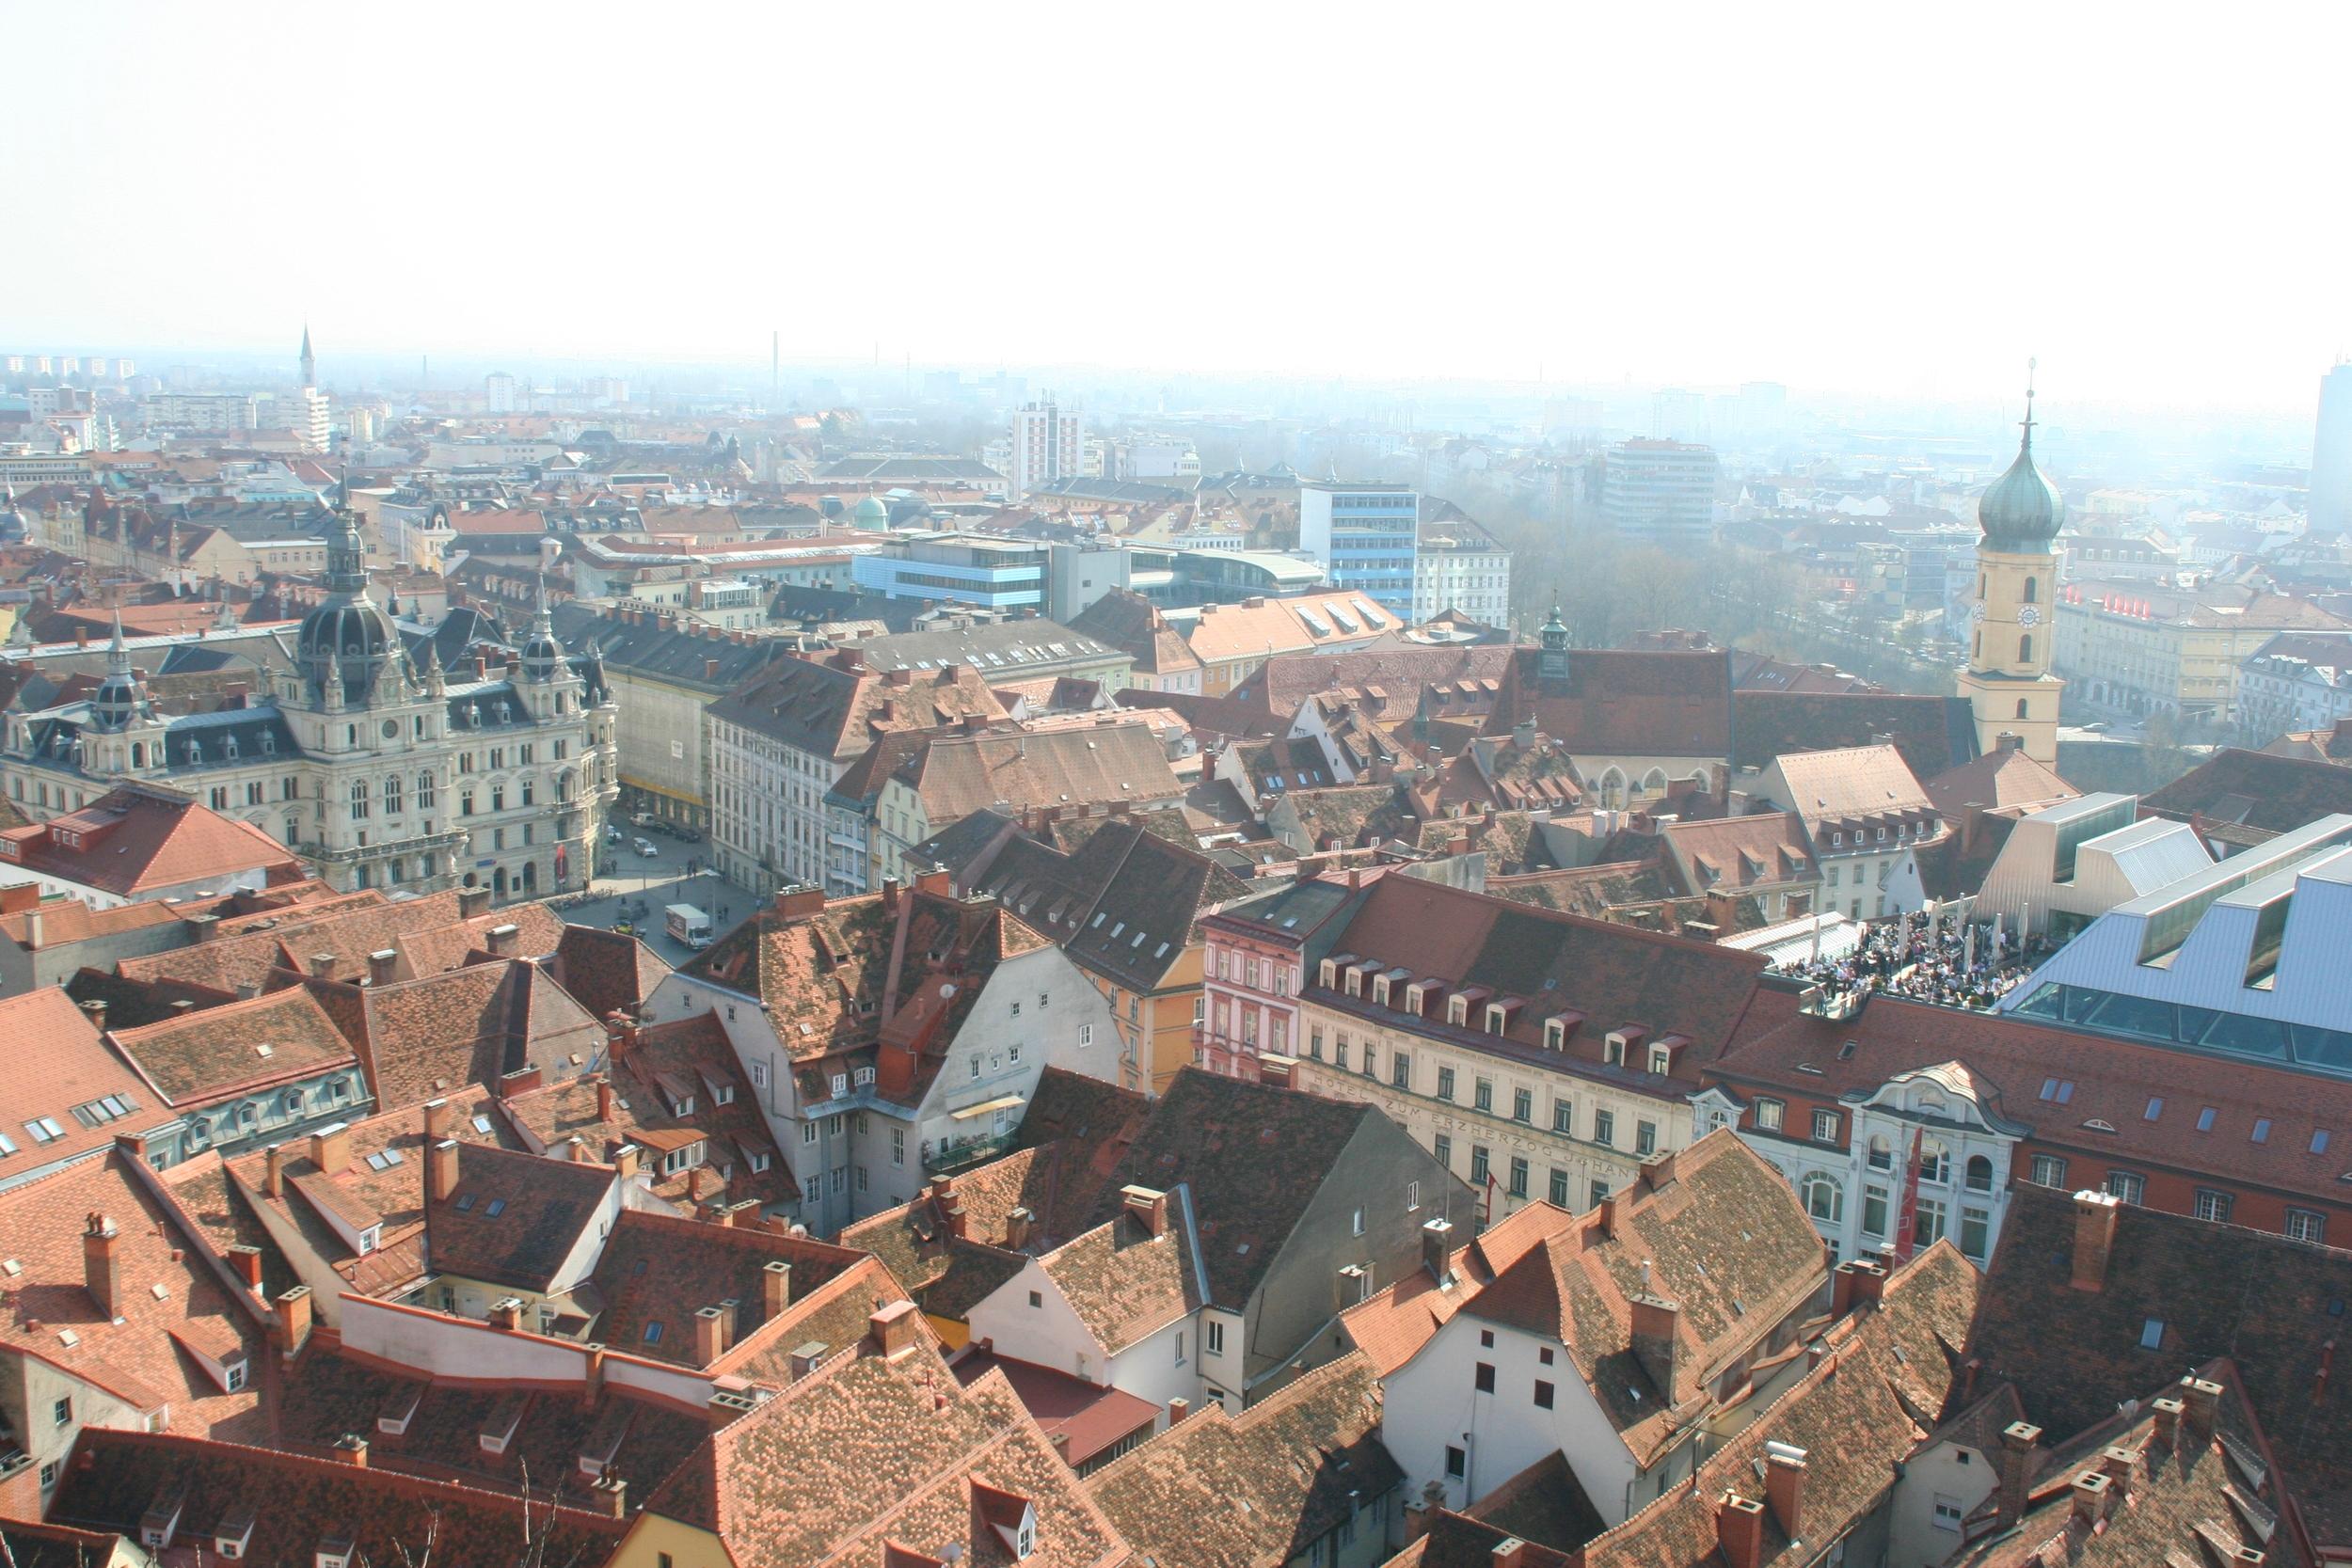 Graz Rooftops as viewed from Schlossberg